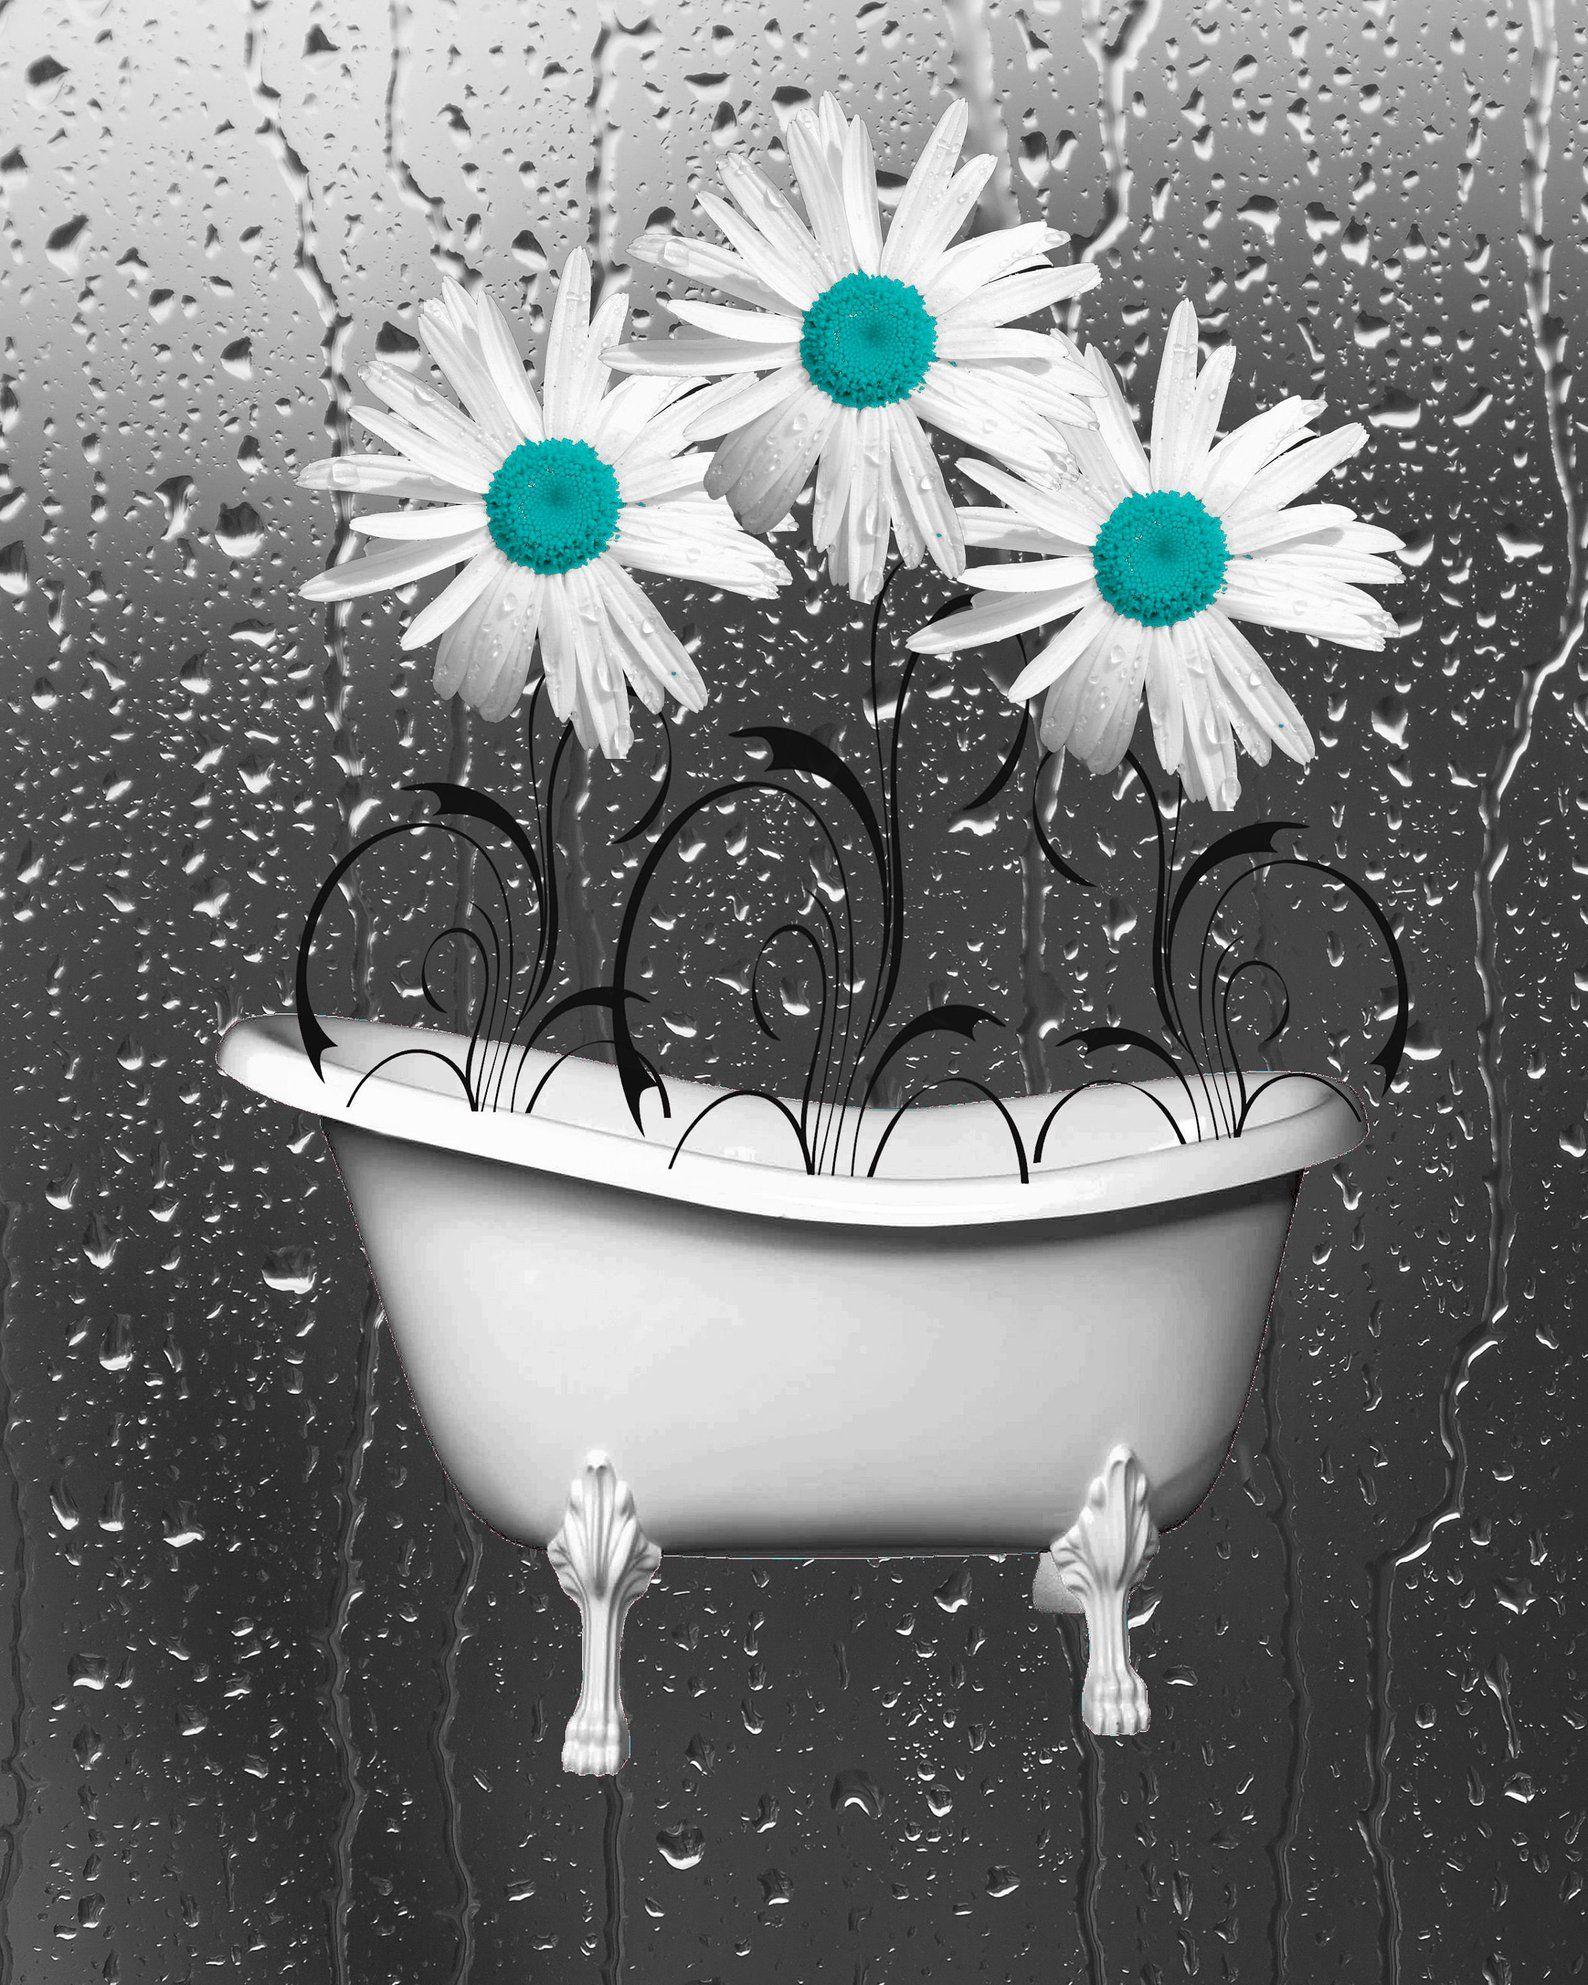 teal gray bathroom wall art daisy flowers raindrops on bathroom wall decor id=80841